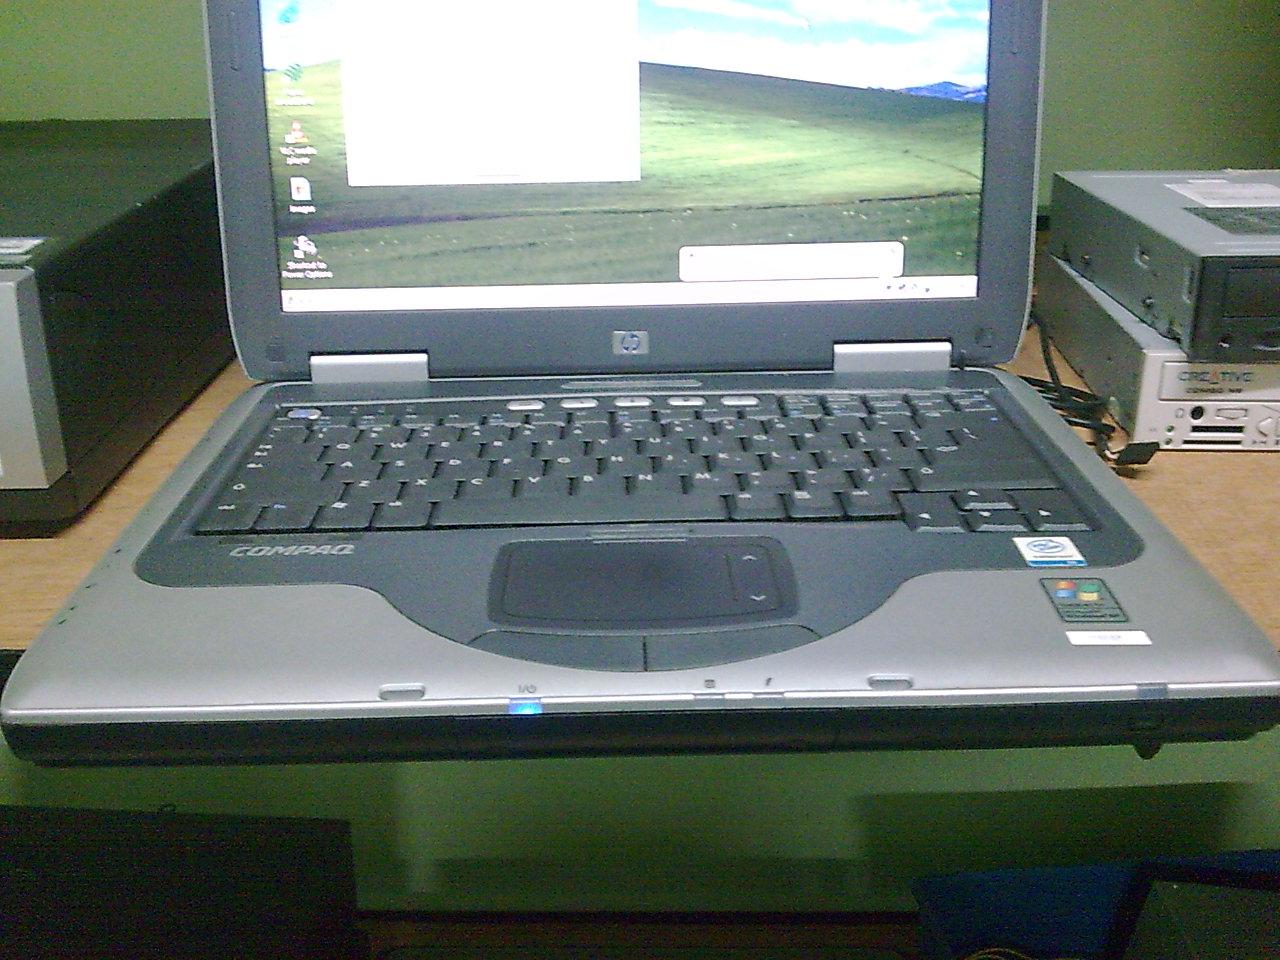 Laptop murah terpakai untuk dijual